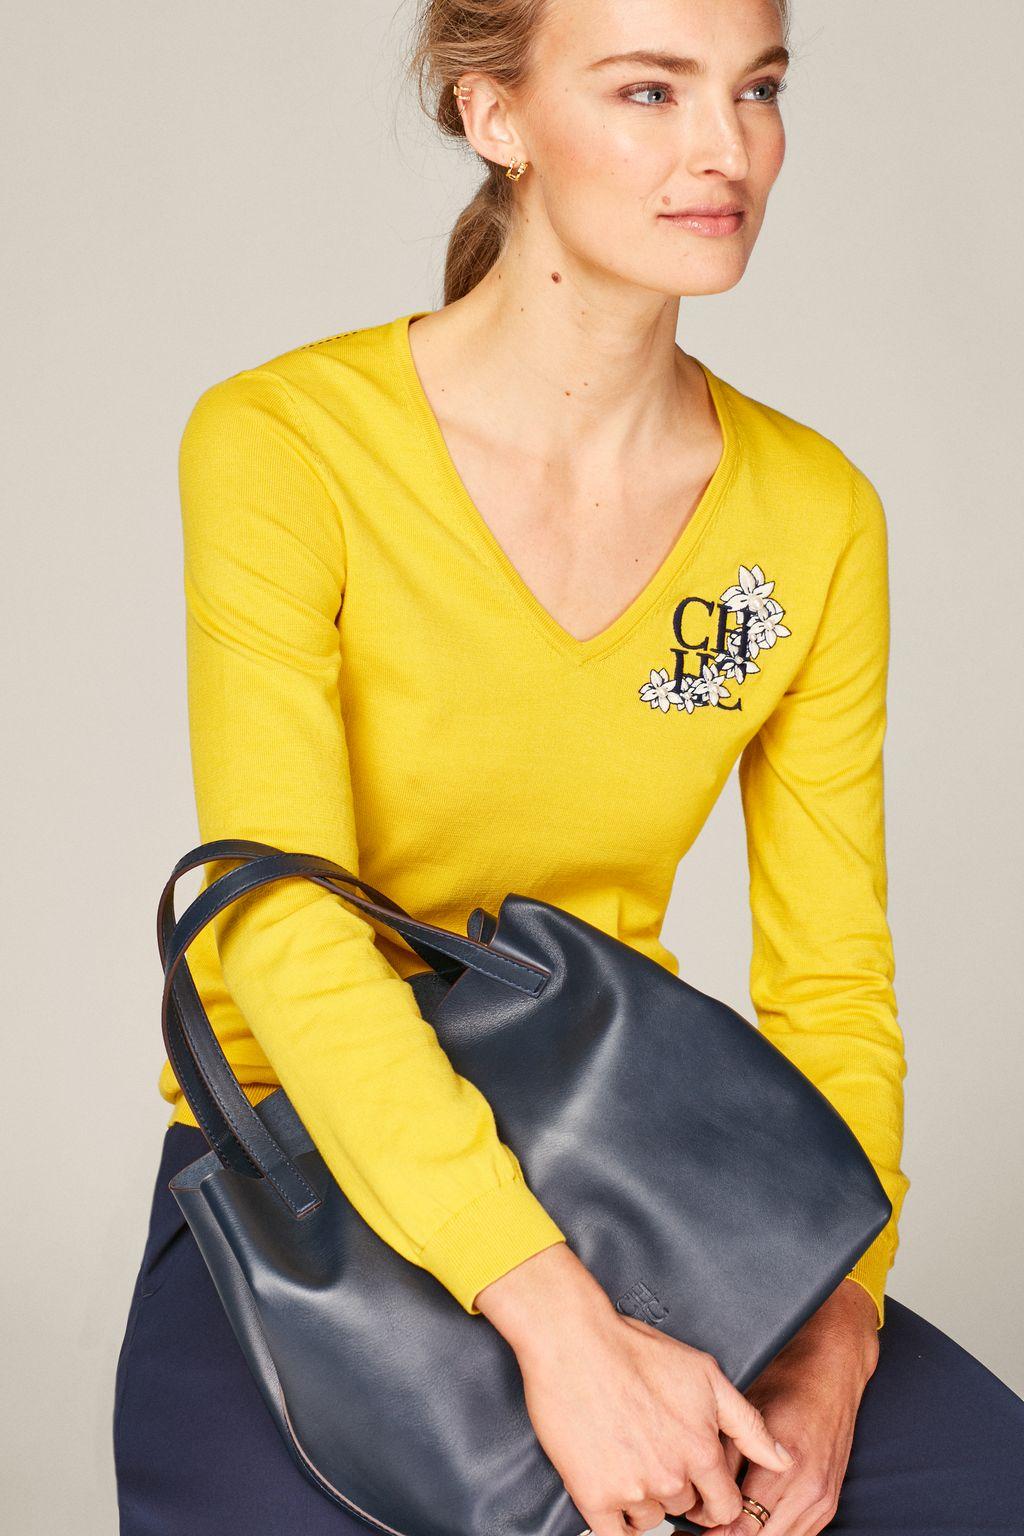 CH Jasmine V-neck sweater